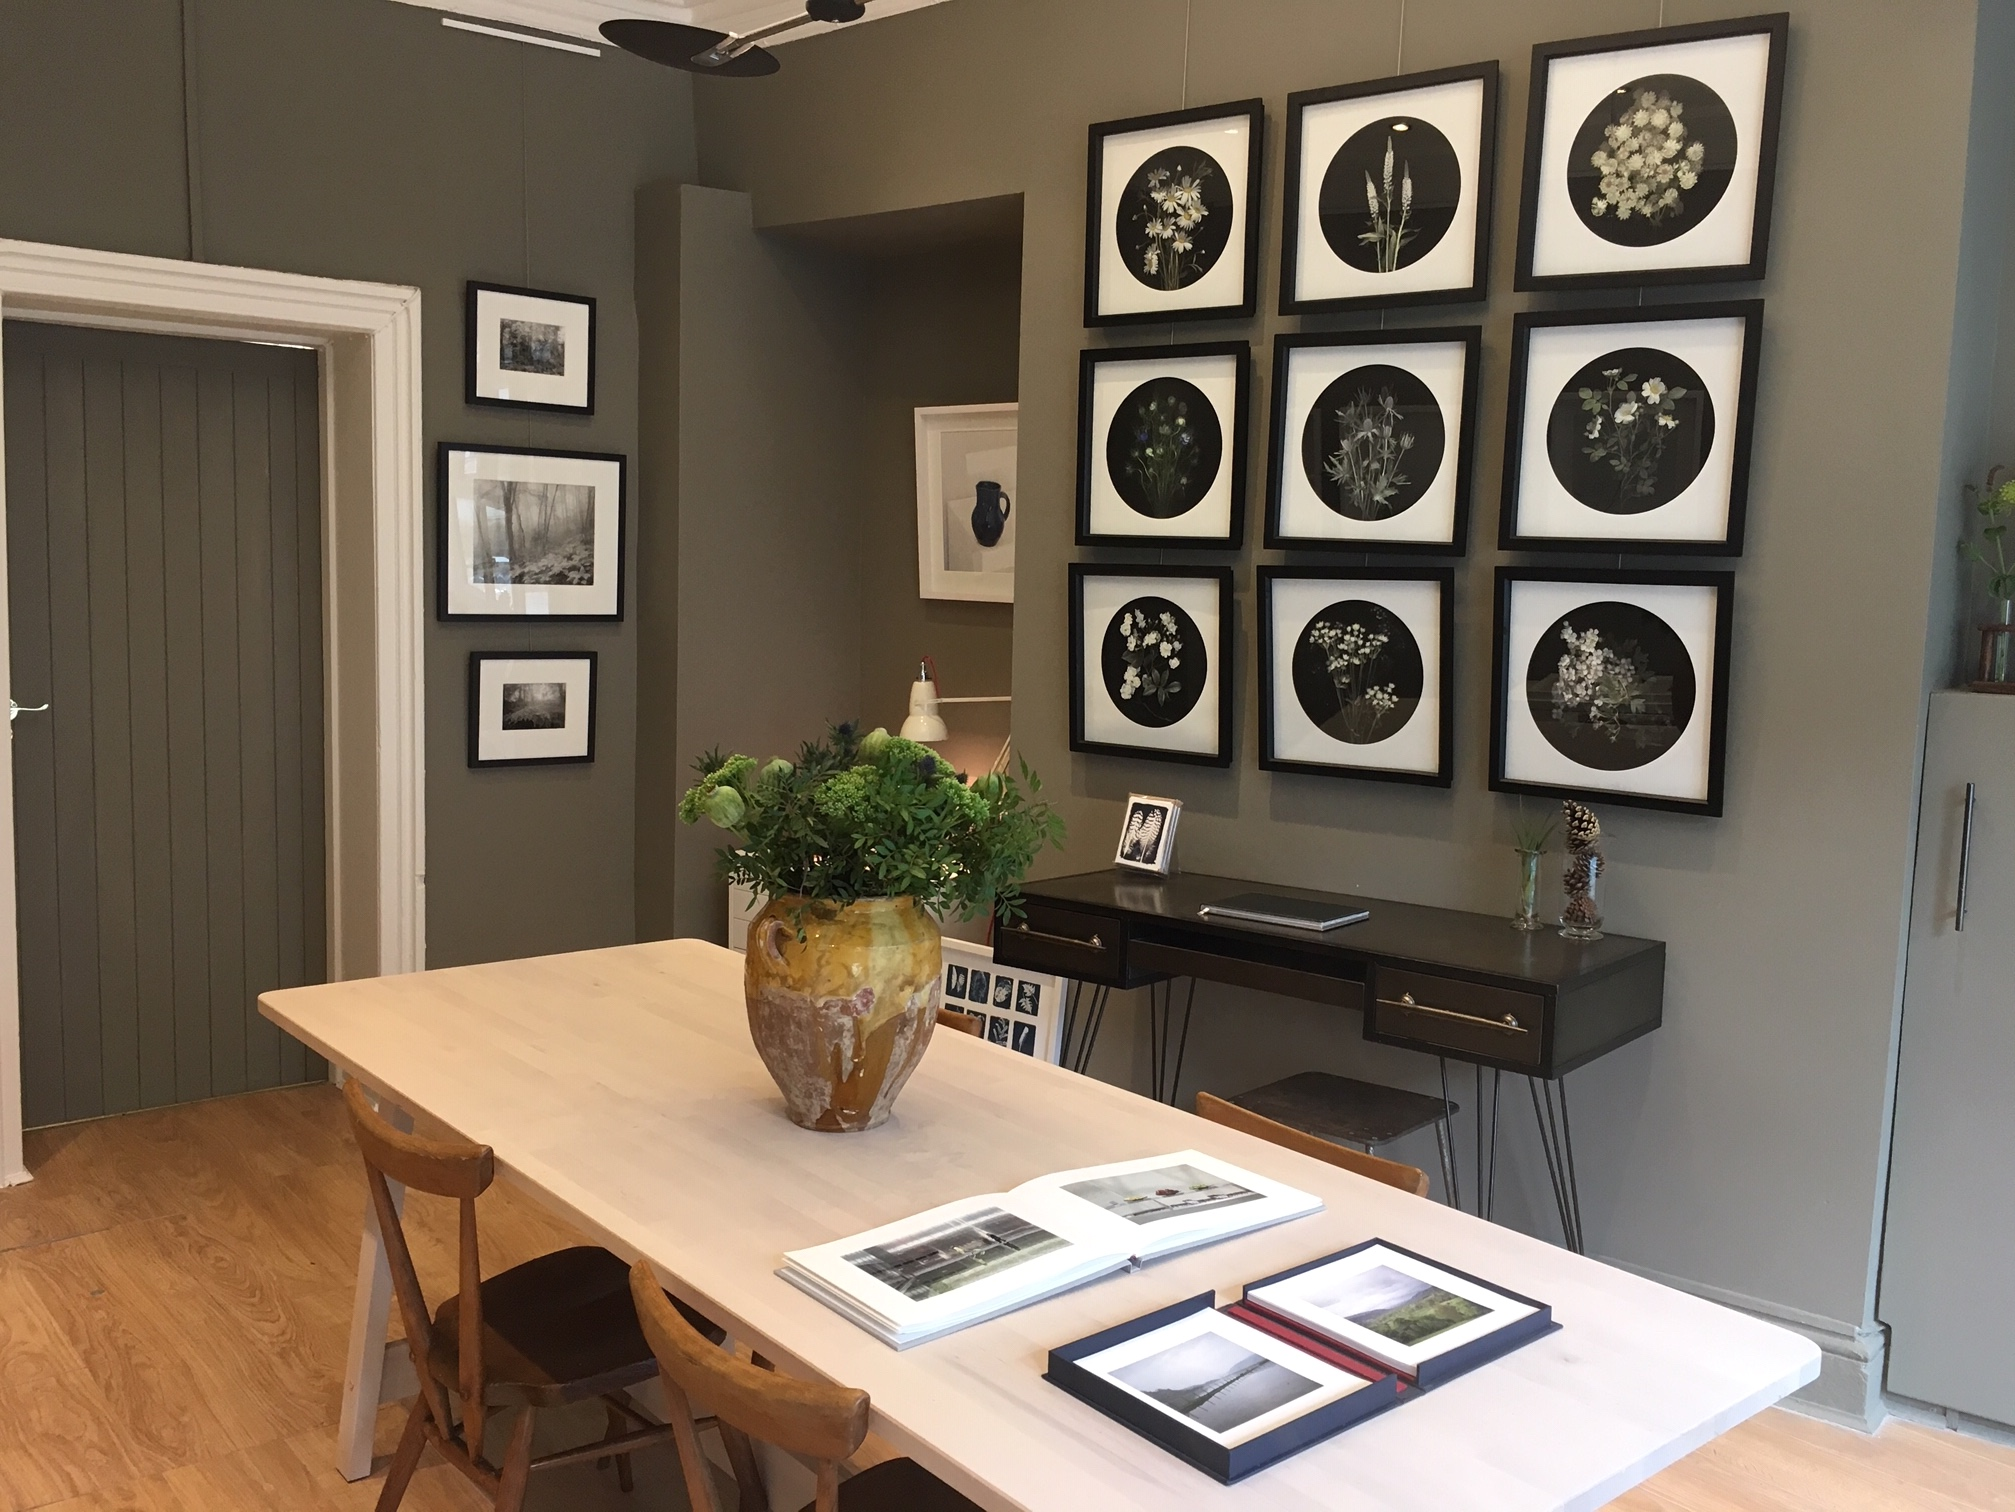 The Gallery and Studio at Tilt & Shift Llanrwst .